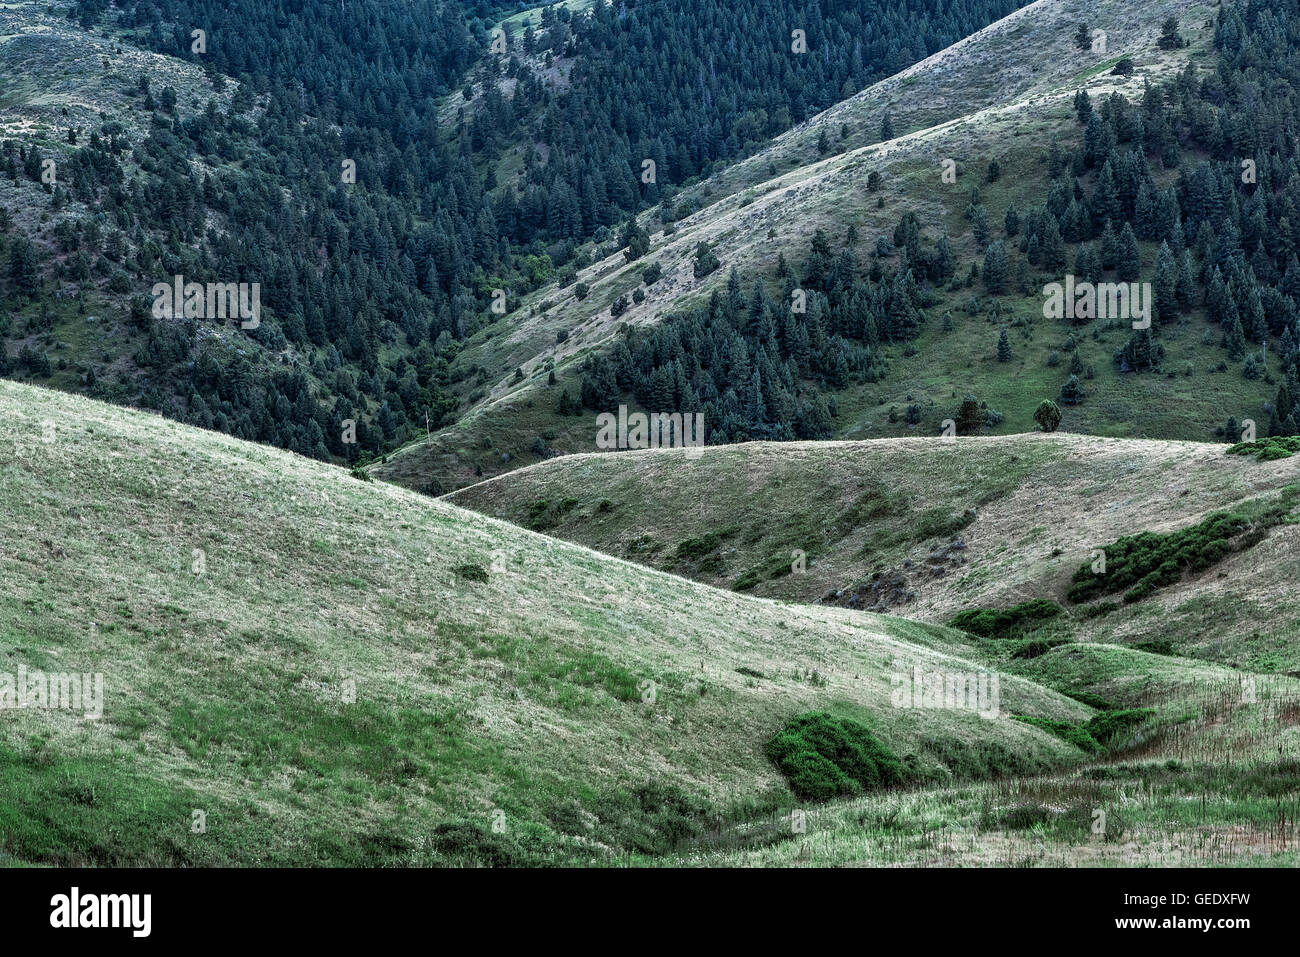 Foothill landscape, Golden, Colorado, USA - Stock Image